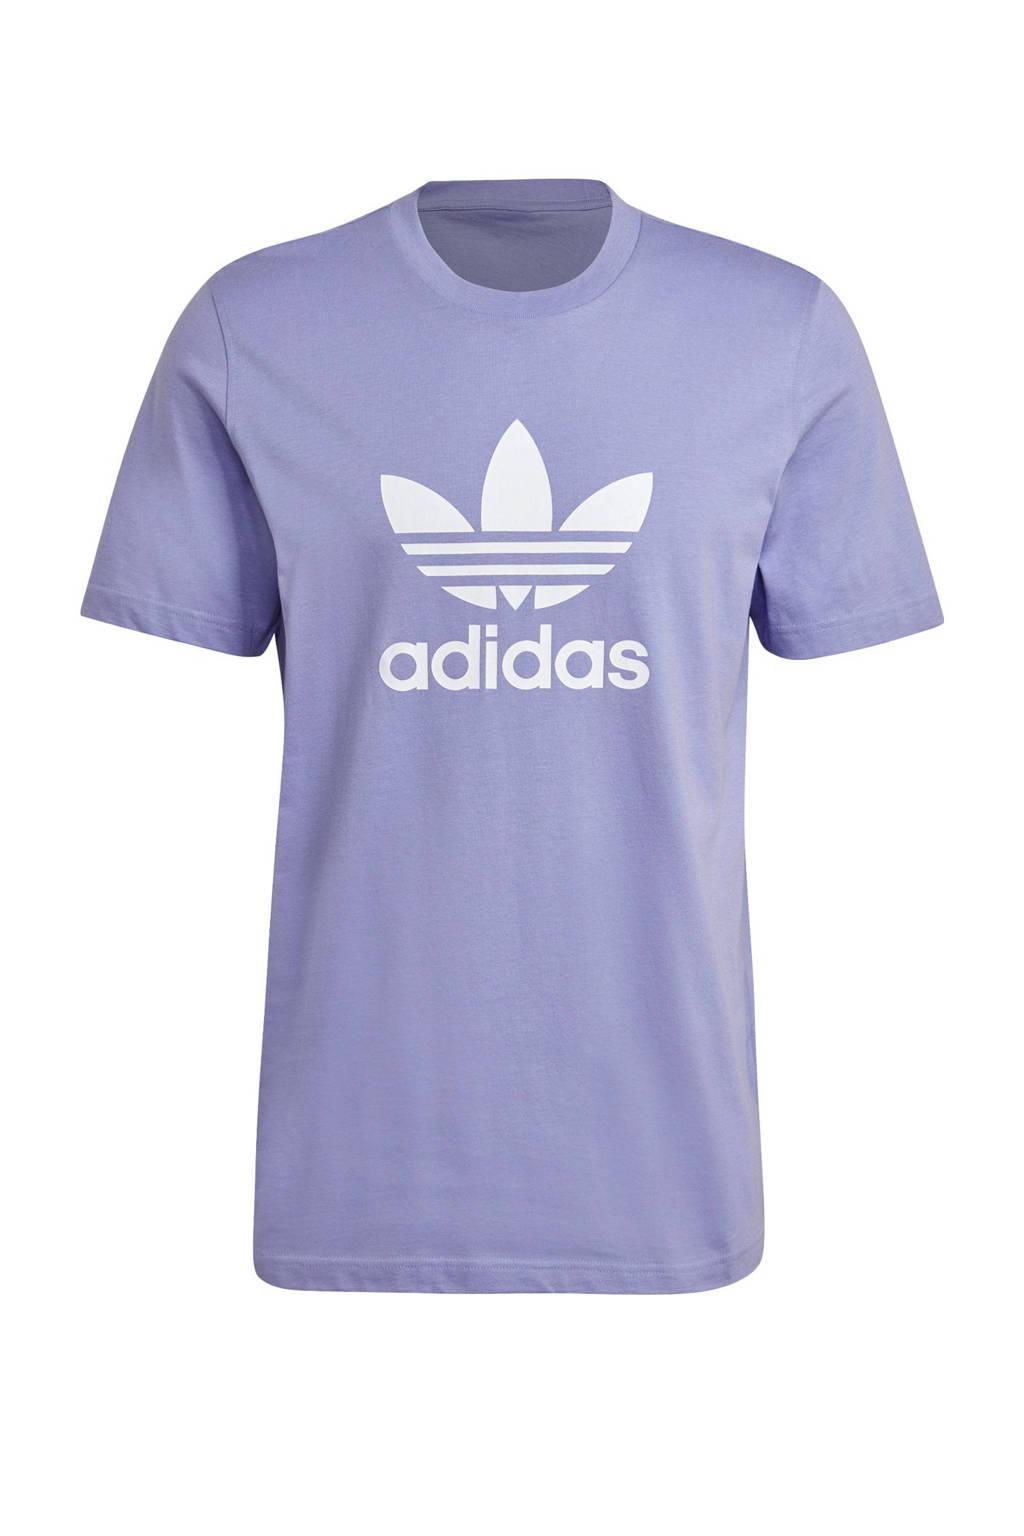 adidas Originals Adicolor T-shirt lila/wit, Lila/wit